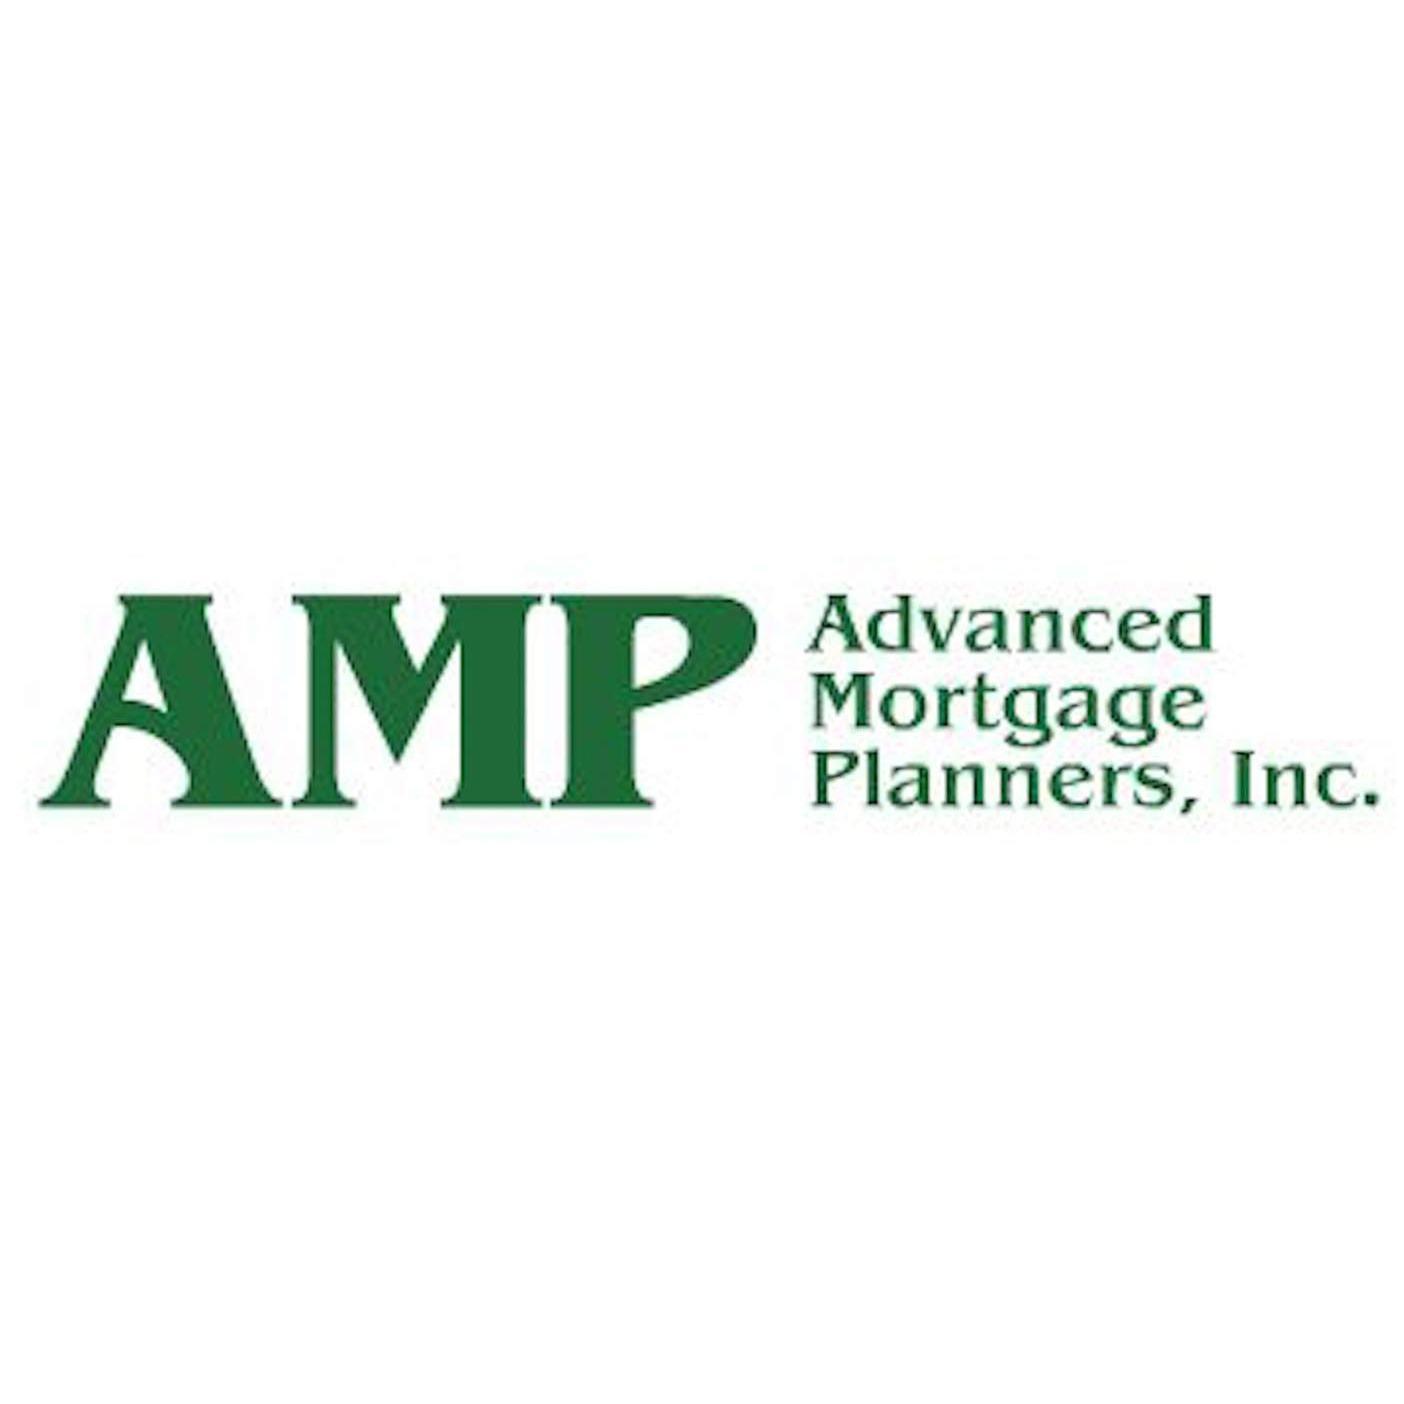 Gail Guy Scott | Advanced Mortgage Planners, Inc.